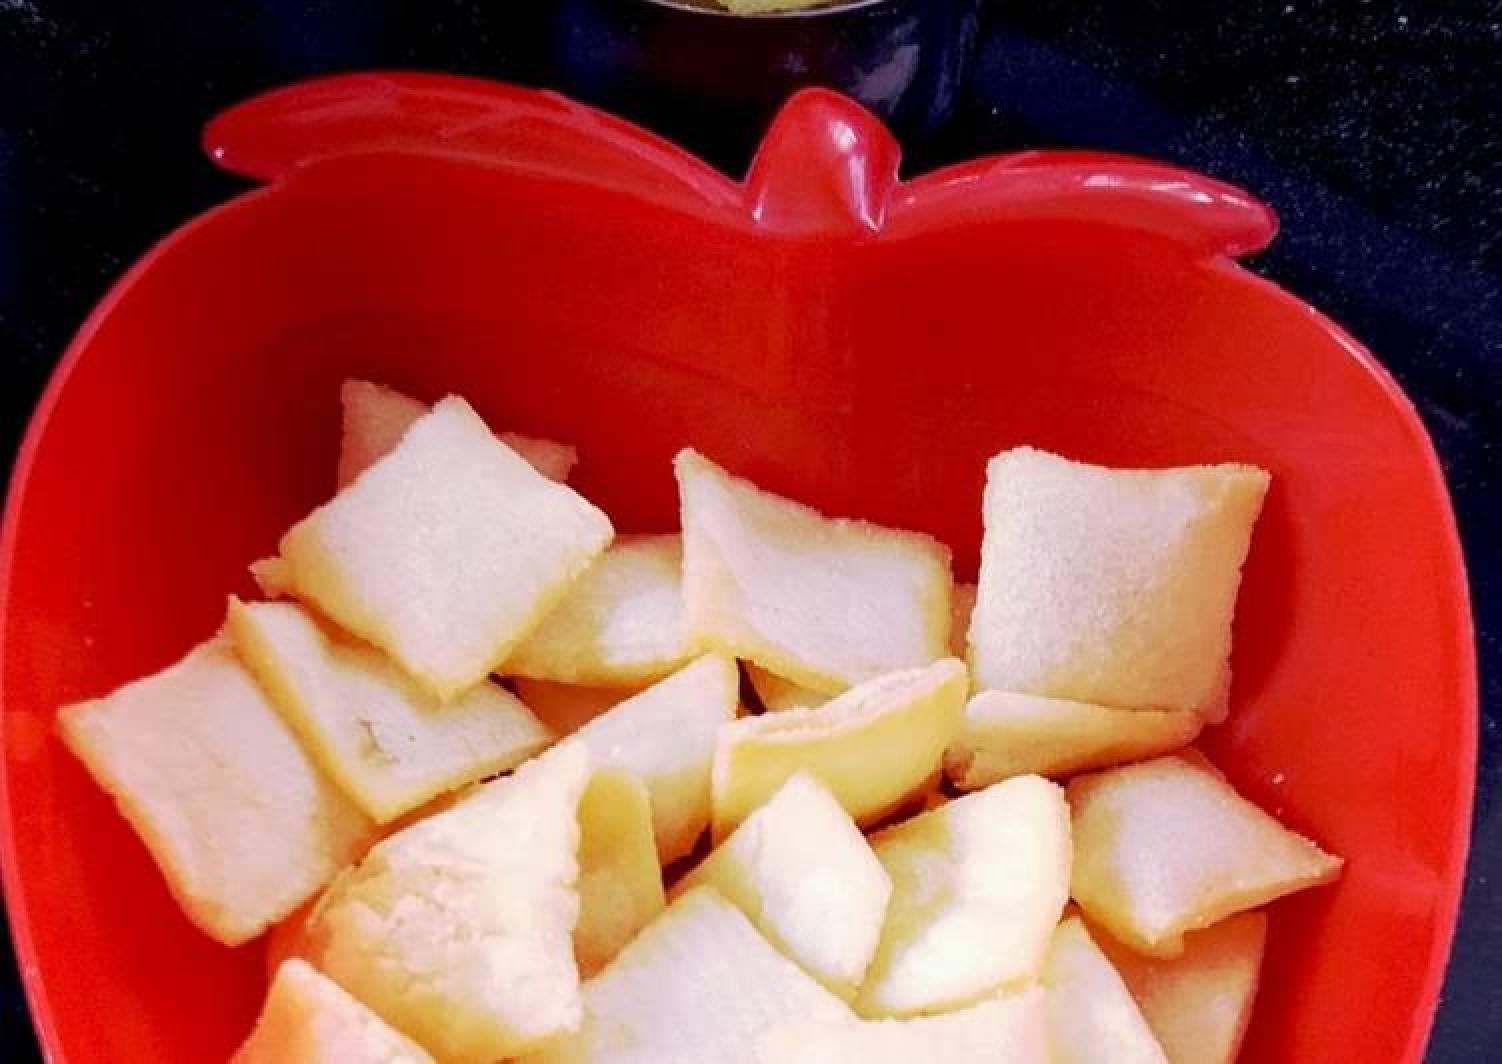 Crispy Rice Flour Snacks